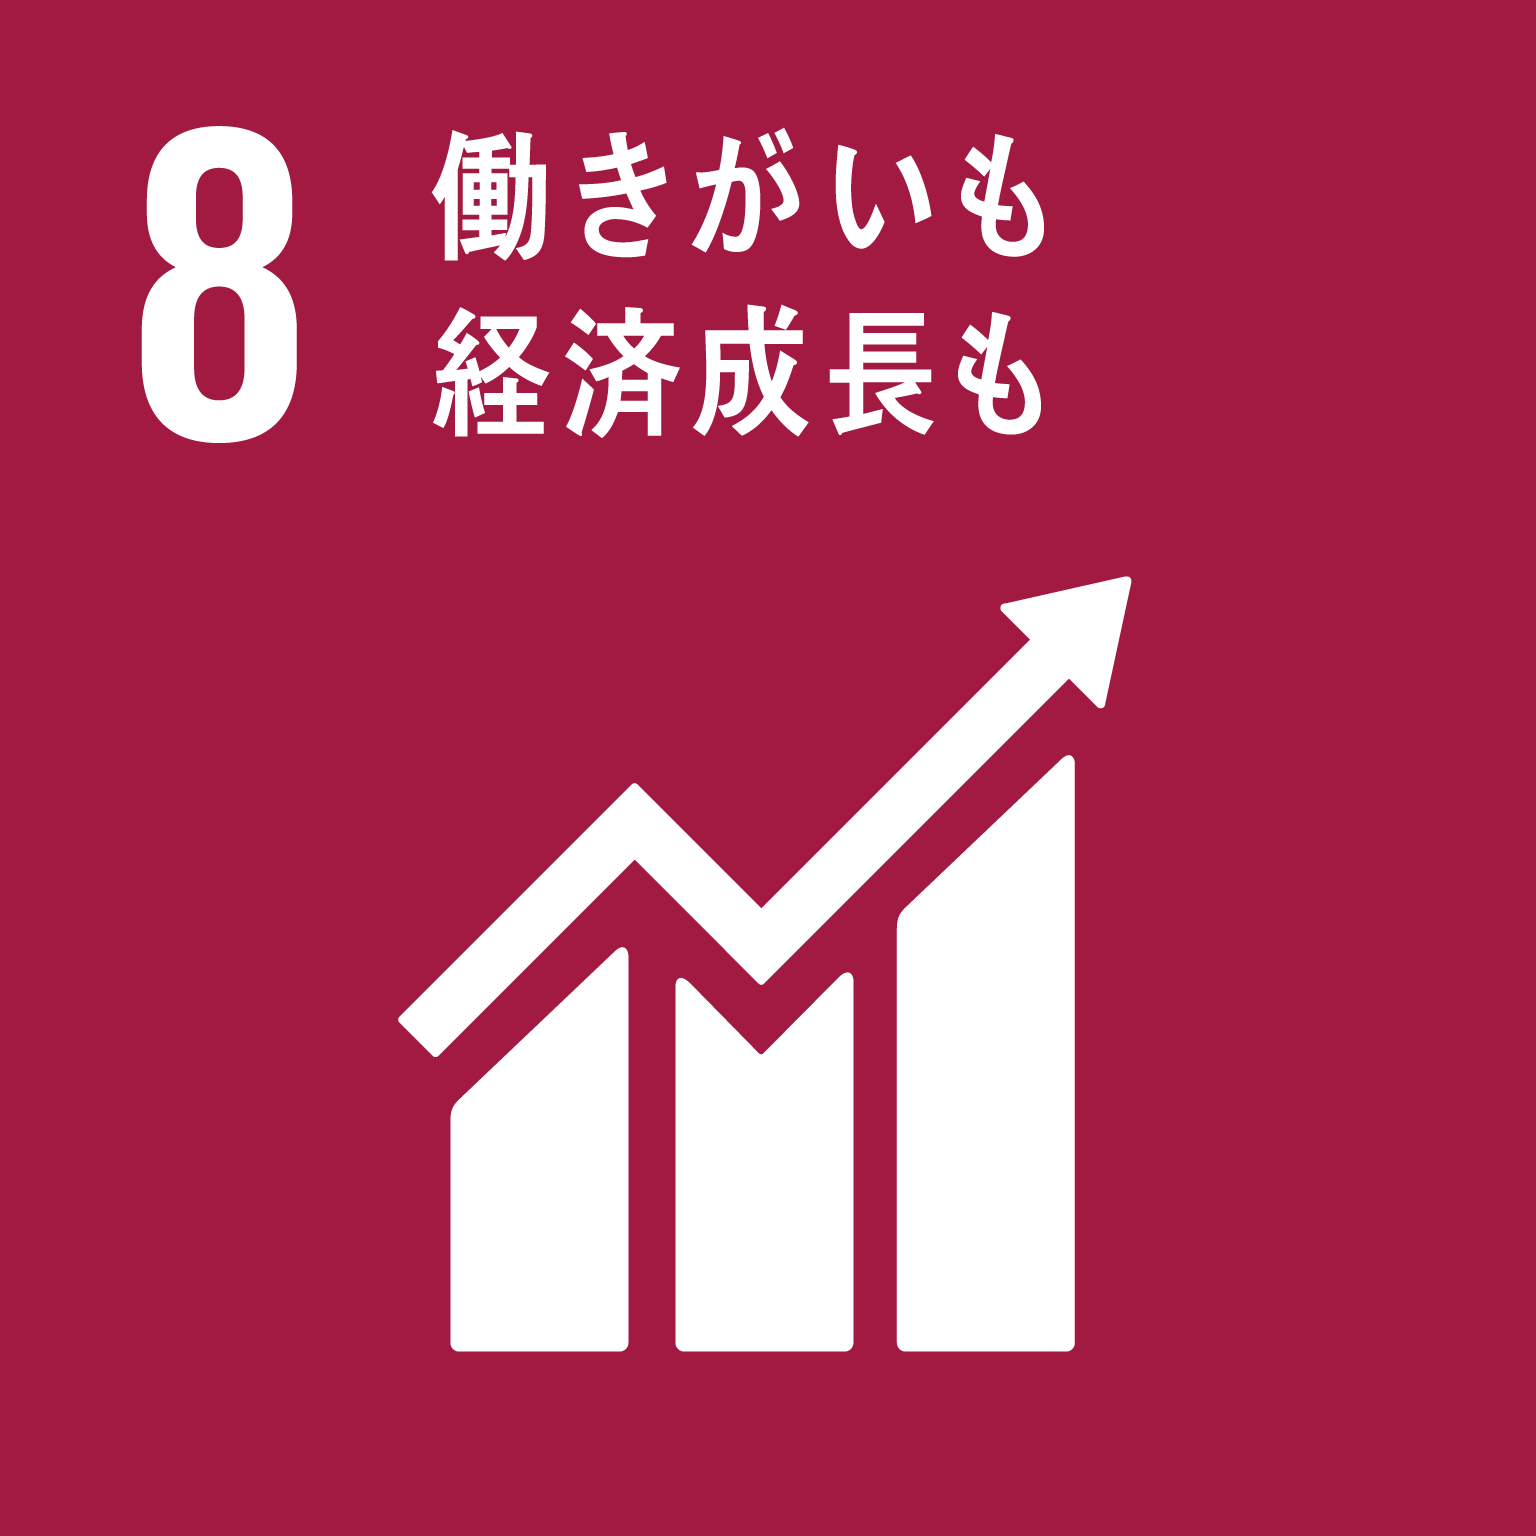 https://www.unic.or.jp/files/sdg_icon_08_ja.png